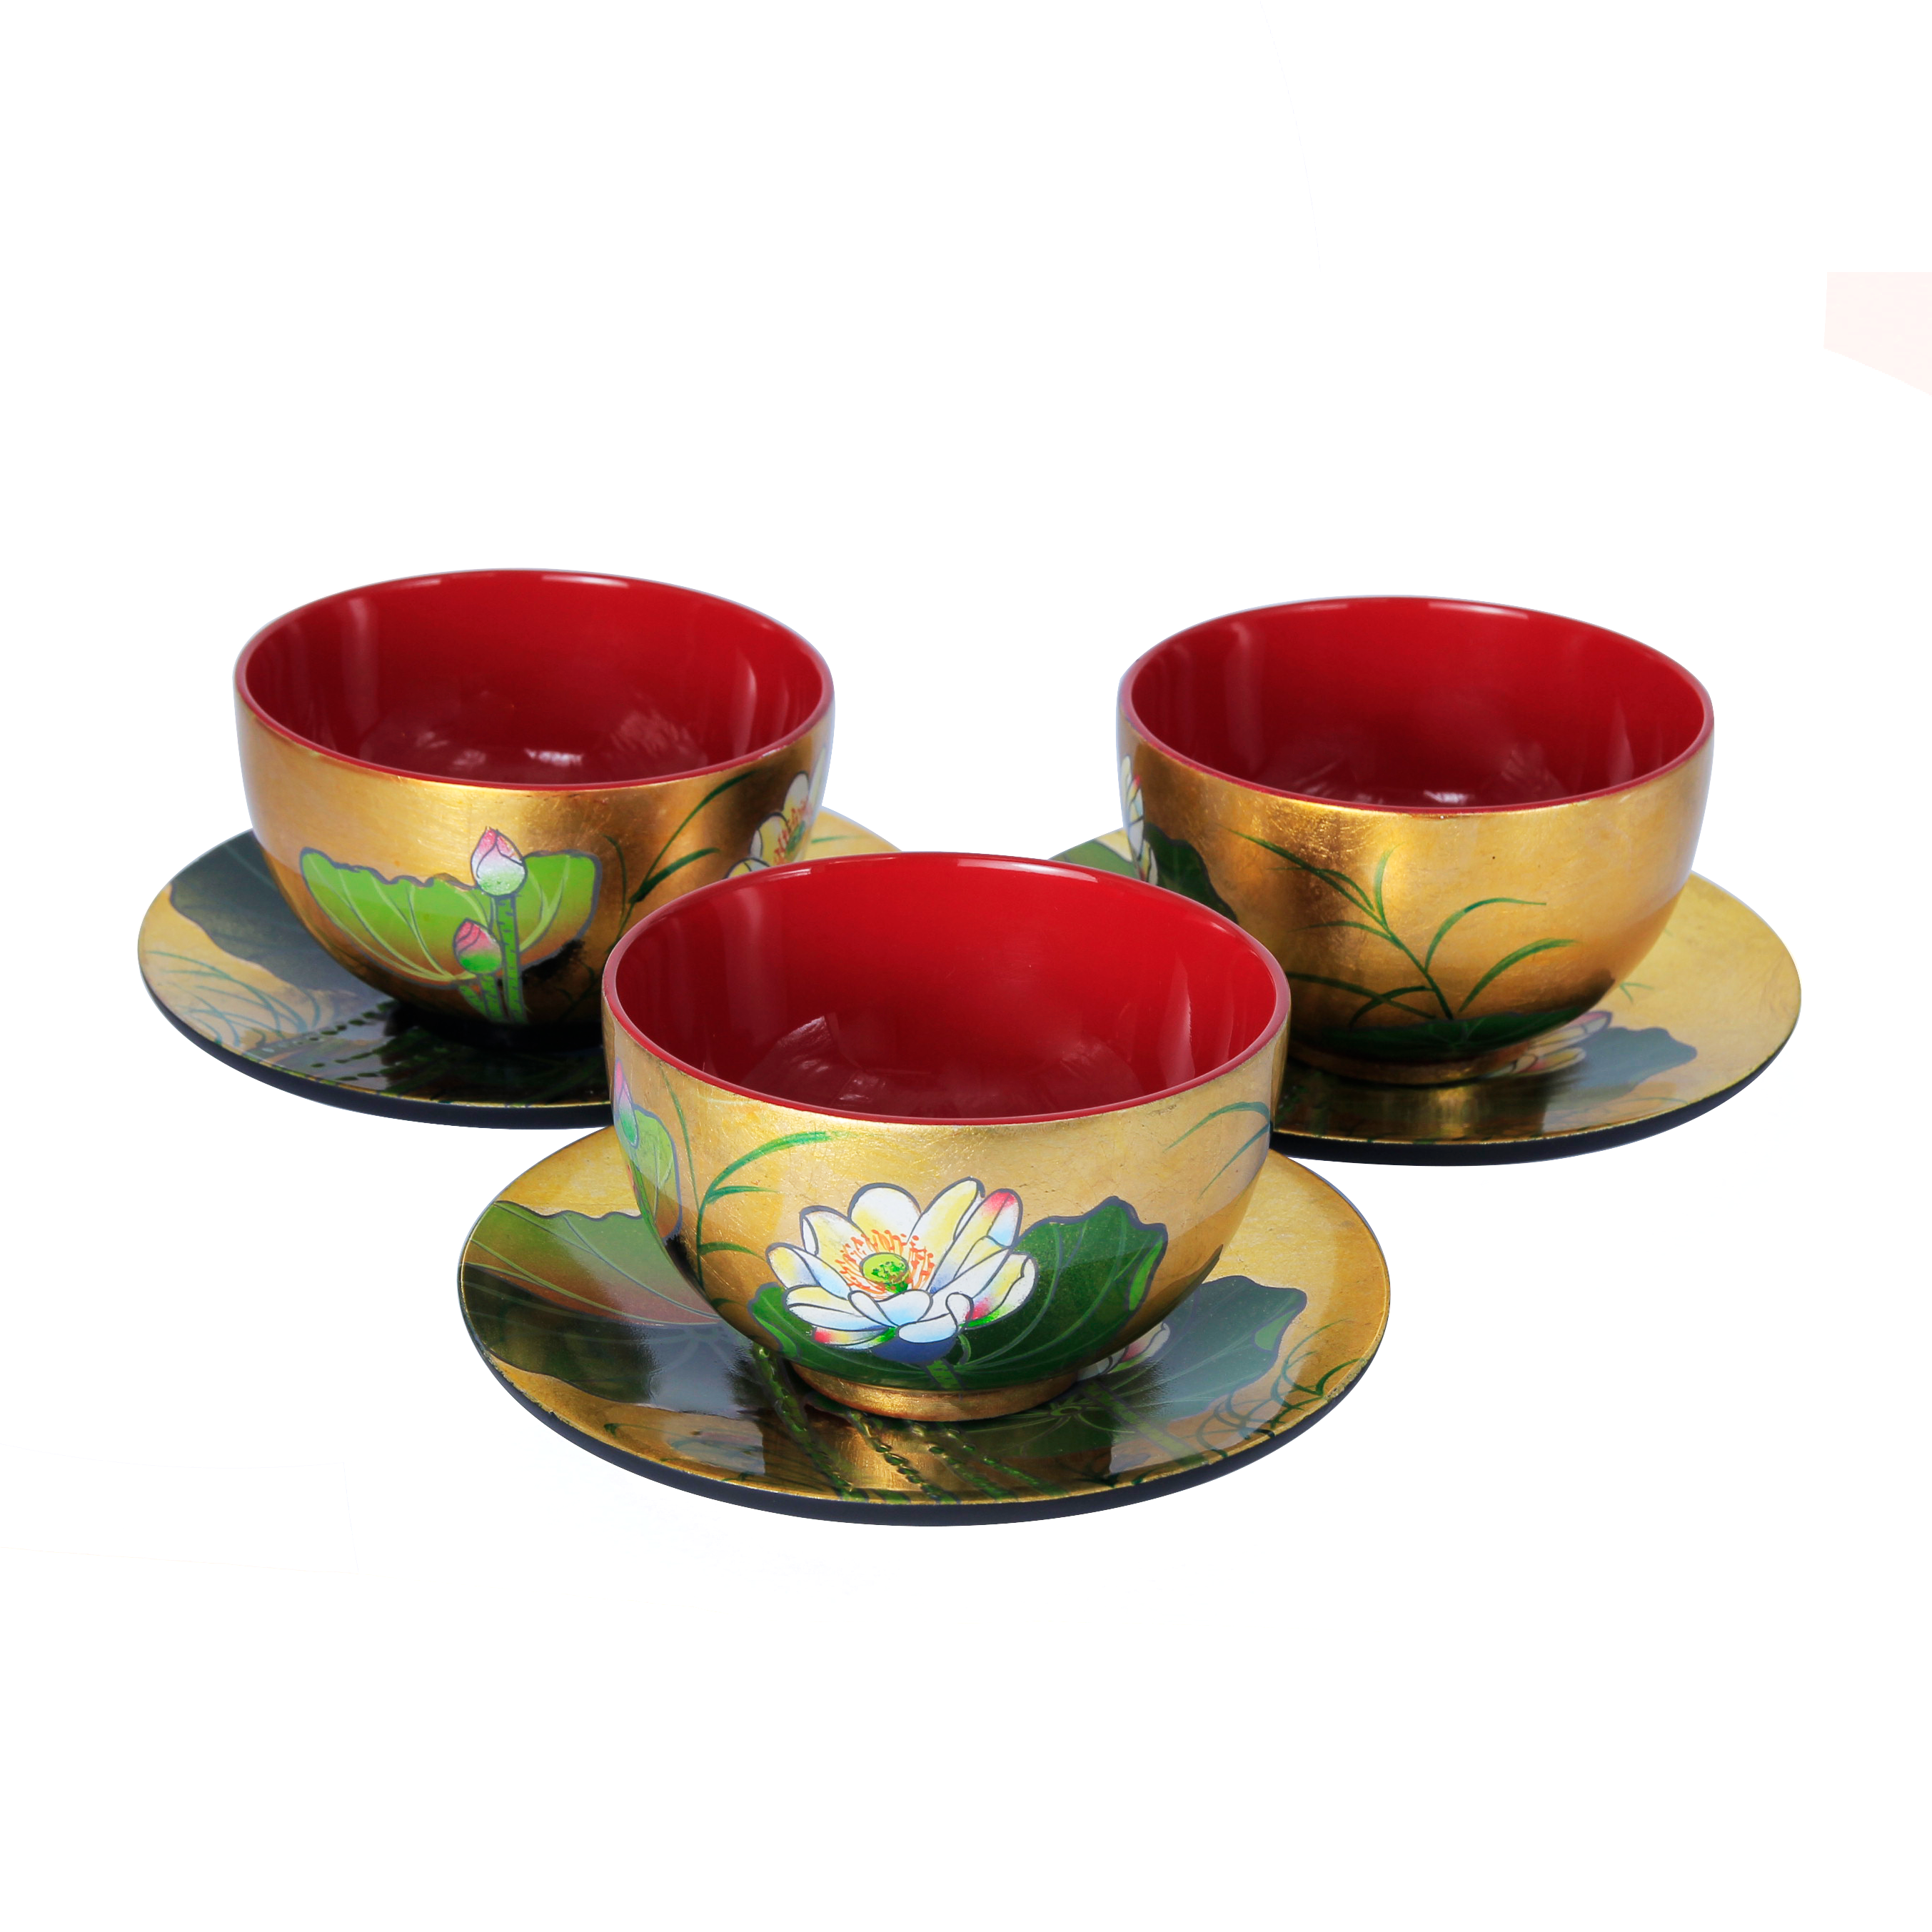 Handicraft Customized Multi-color Lacquer Bowls Version 2020 Premium Quality Wooden Bowl